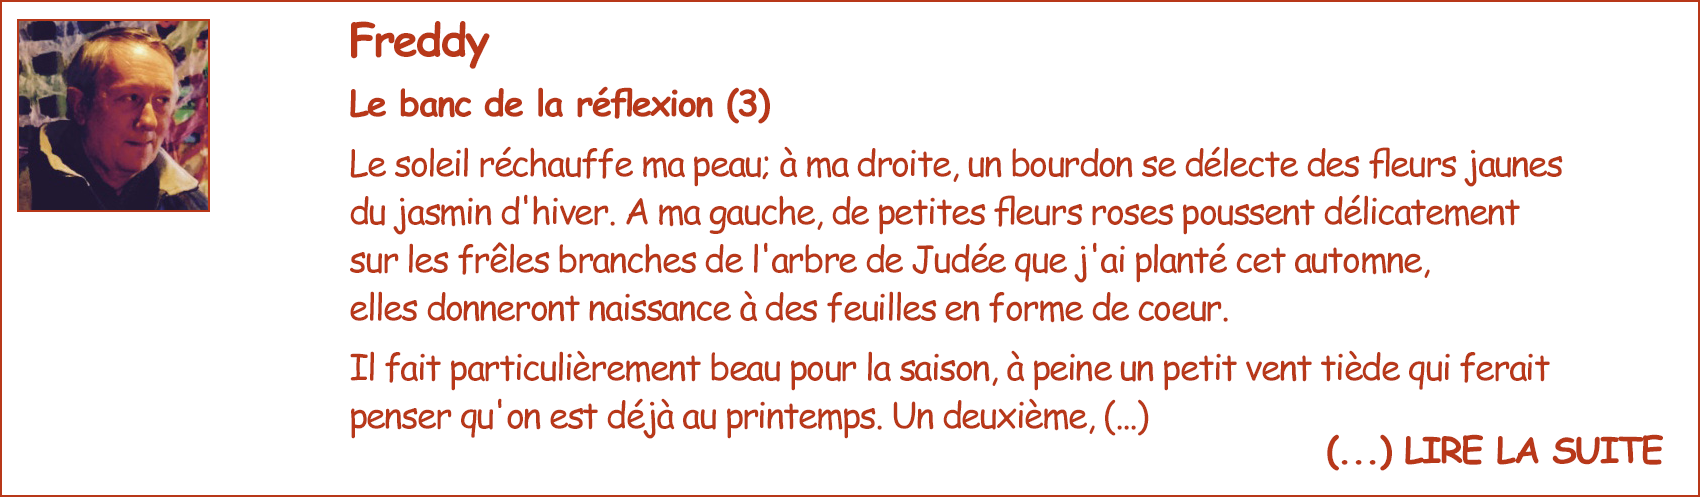 http://slamerie.l.s.f.unblog.fr/files/2021/03/texte-freddy-mars-2021-01.png